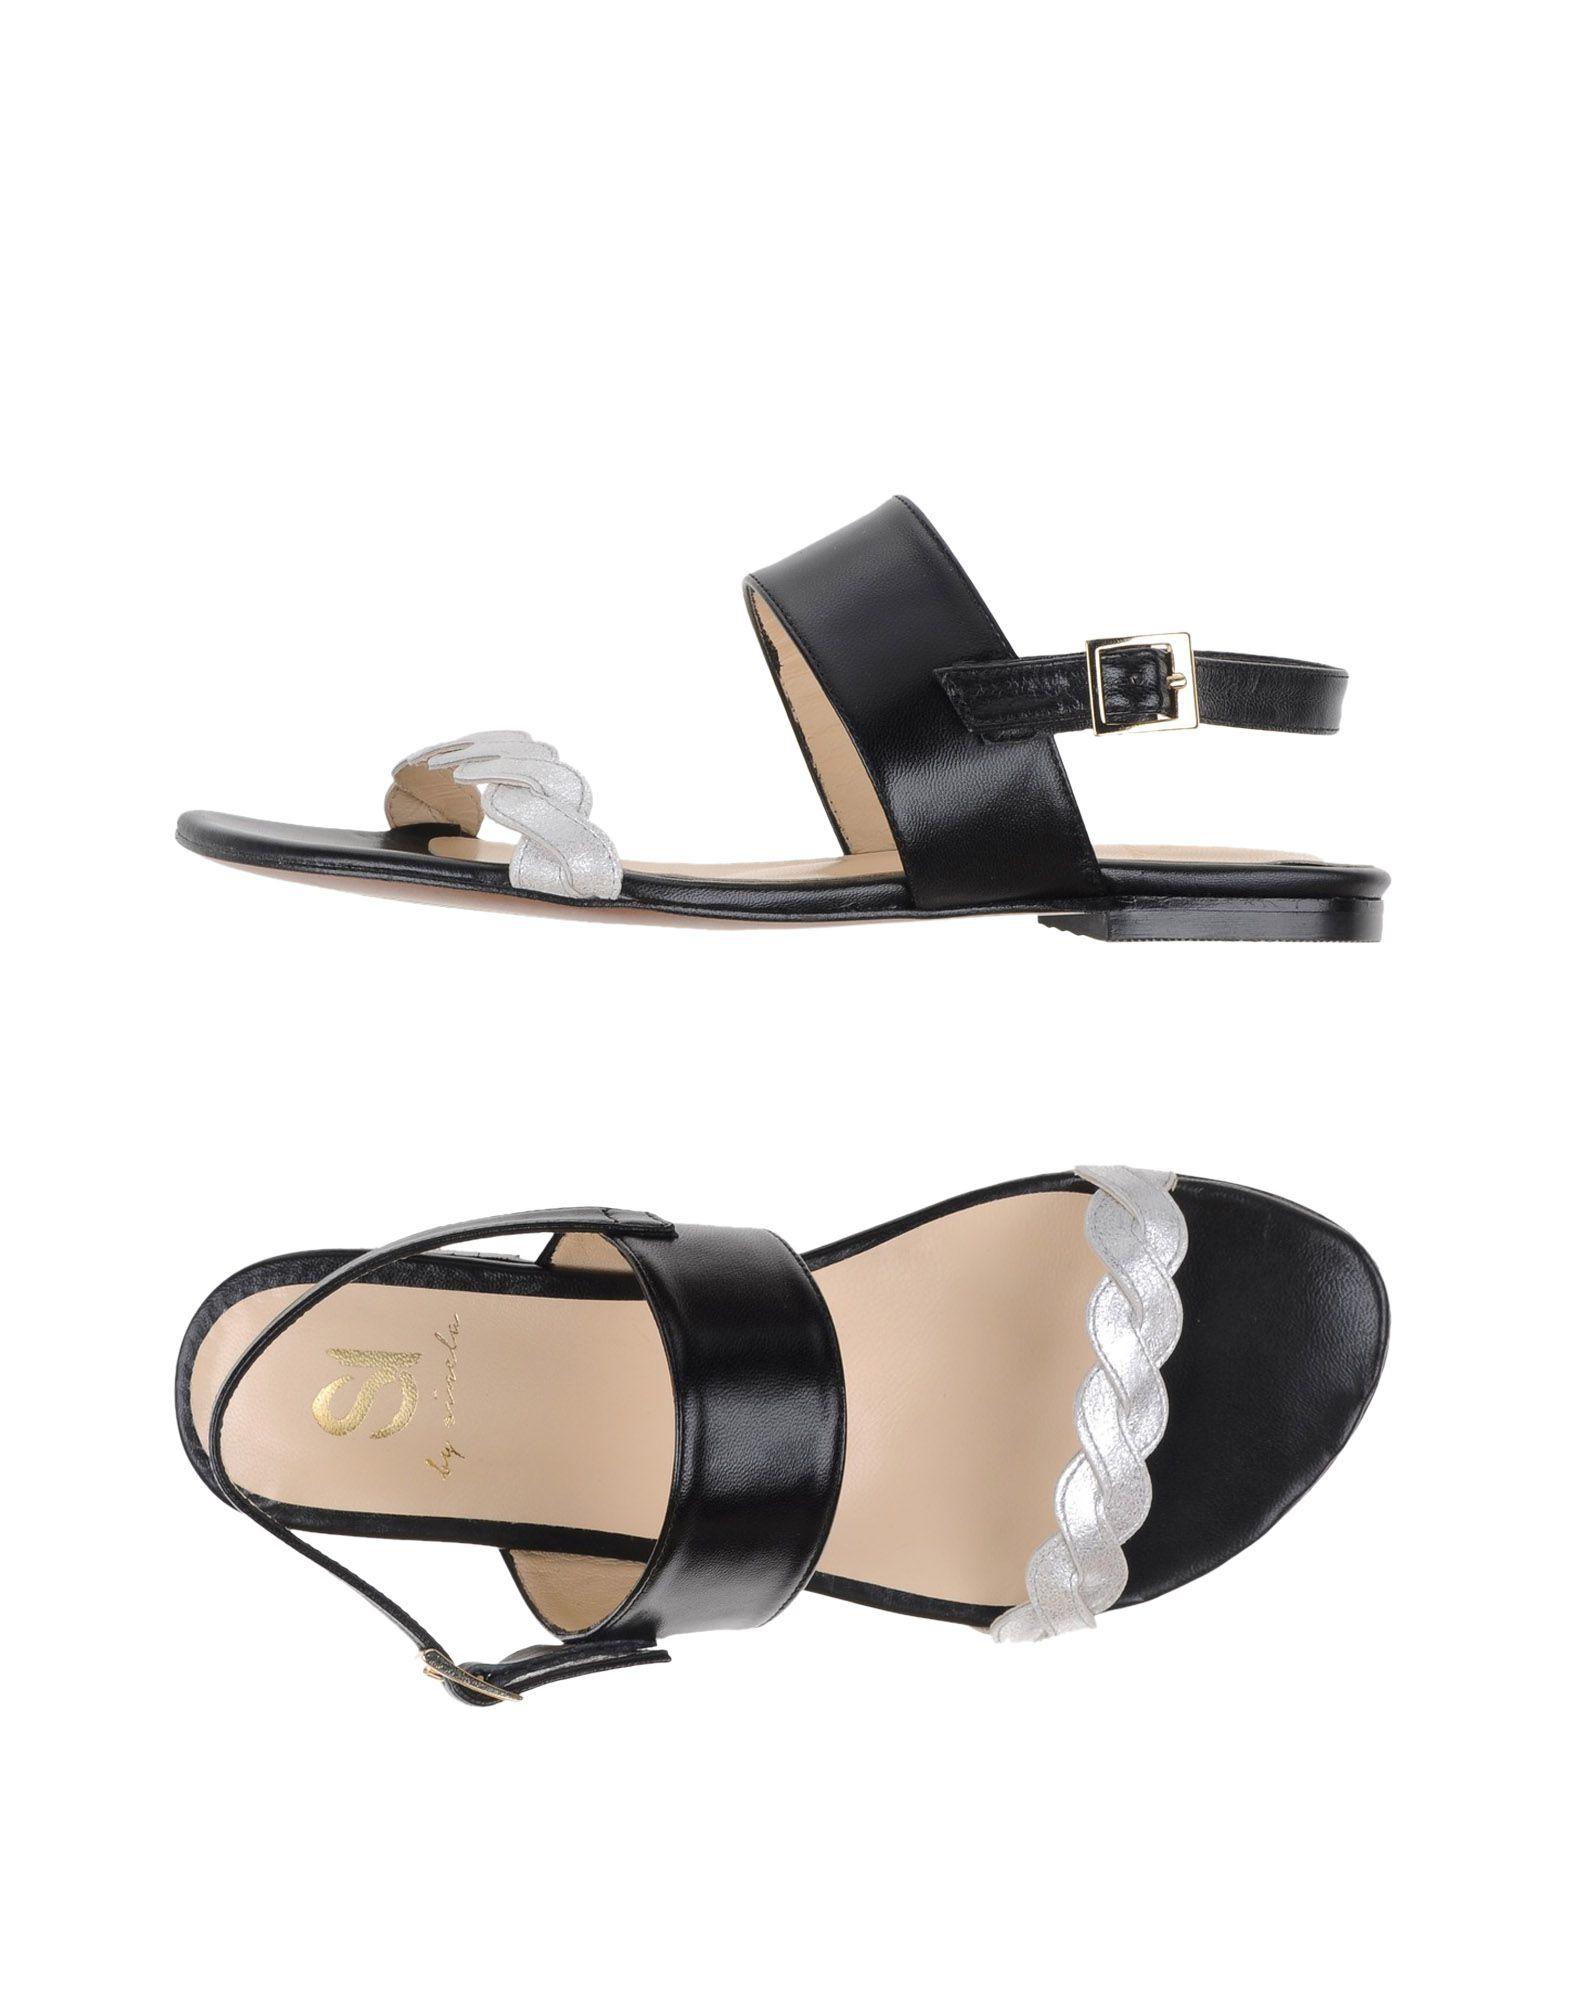 Sandales Si By Sinela Femme - Sandales Si By Sinela sur